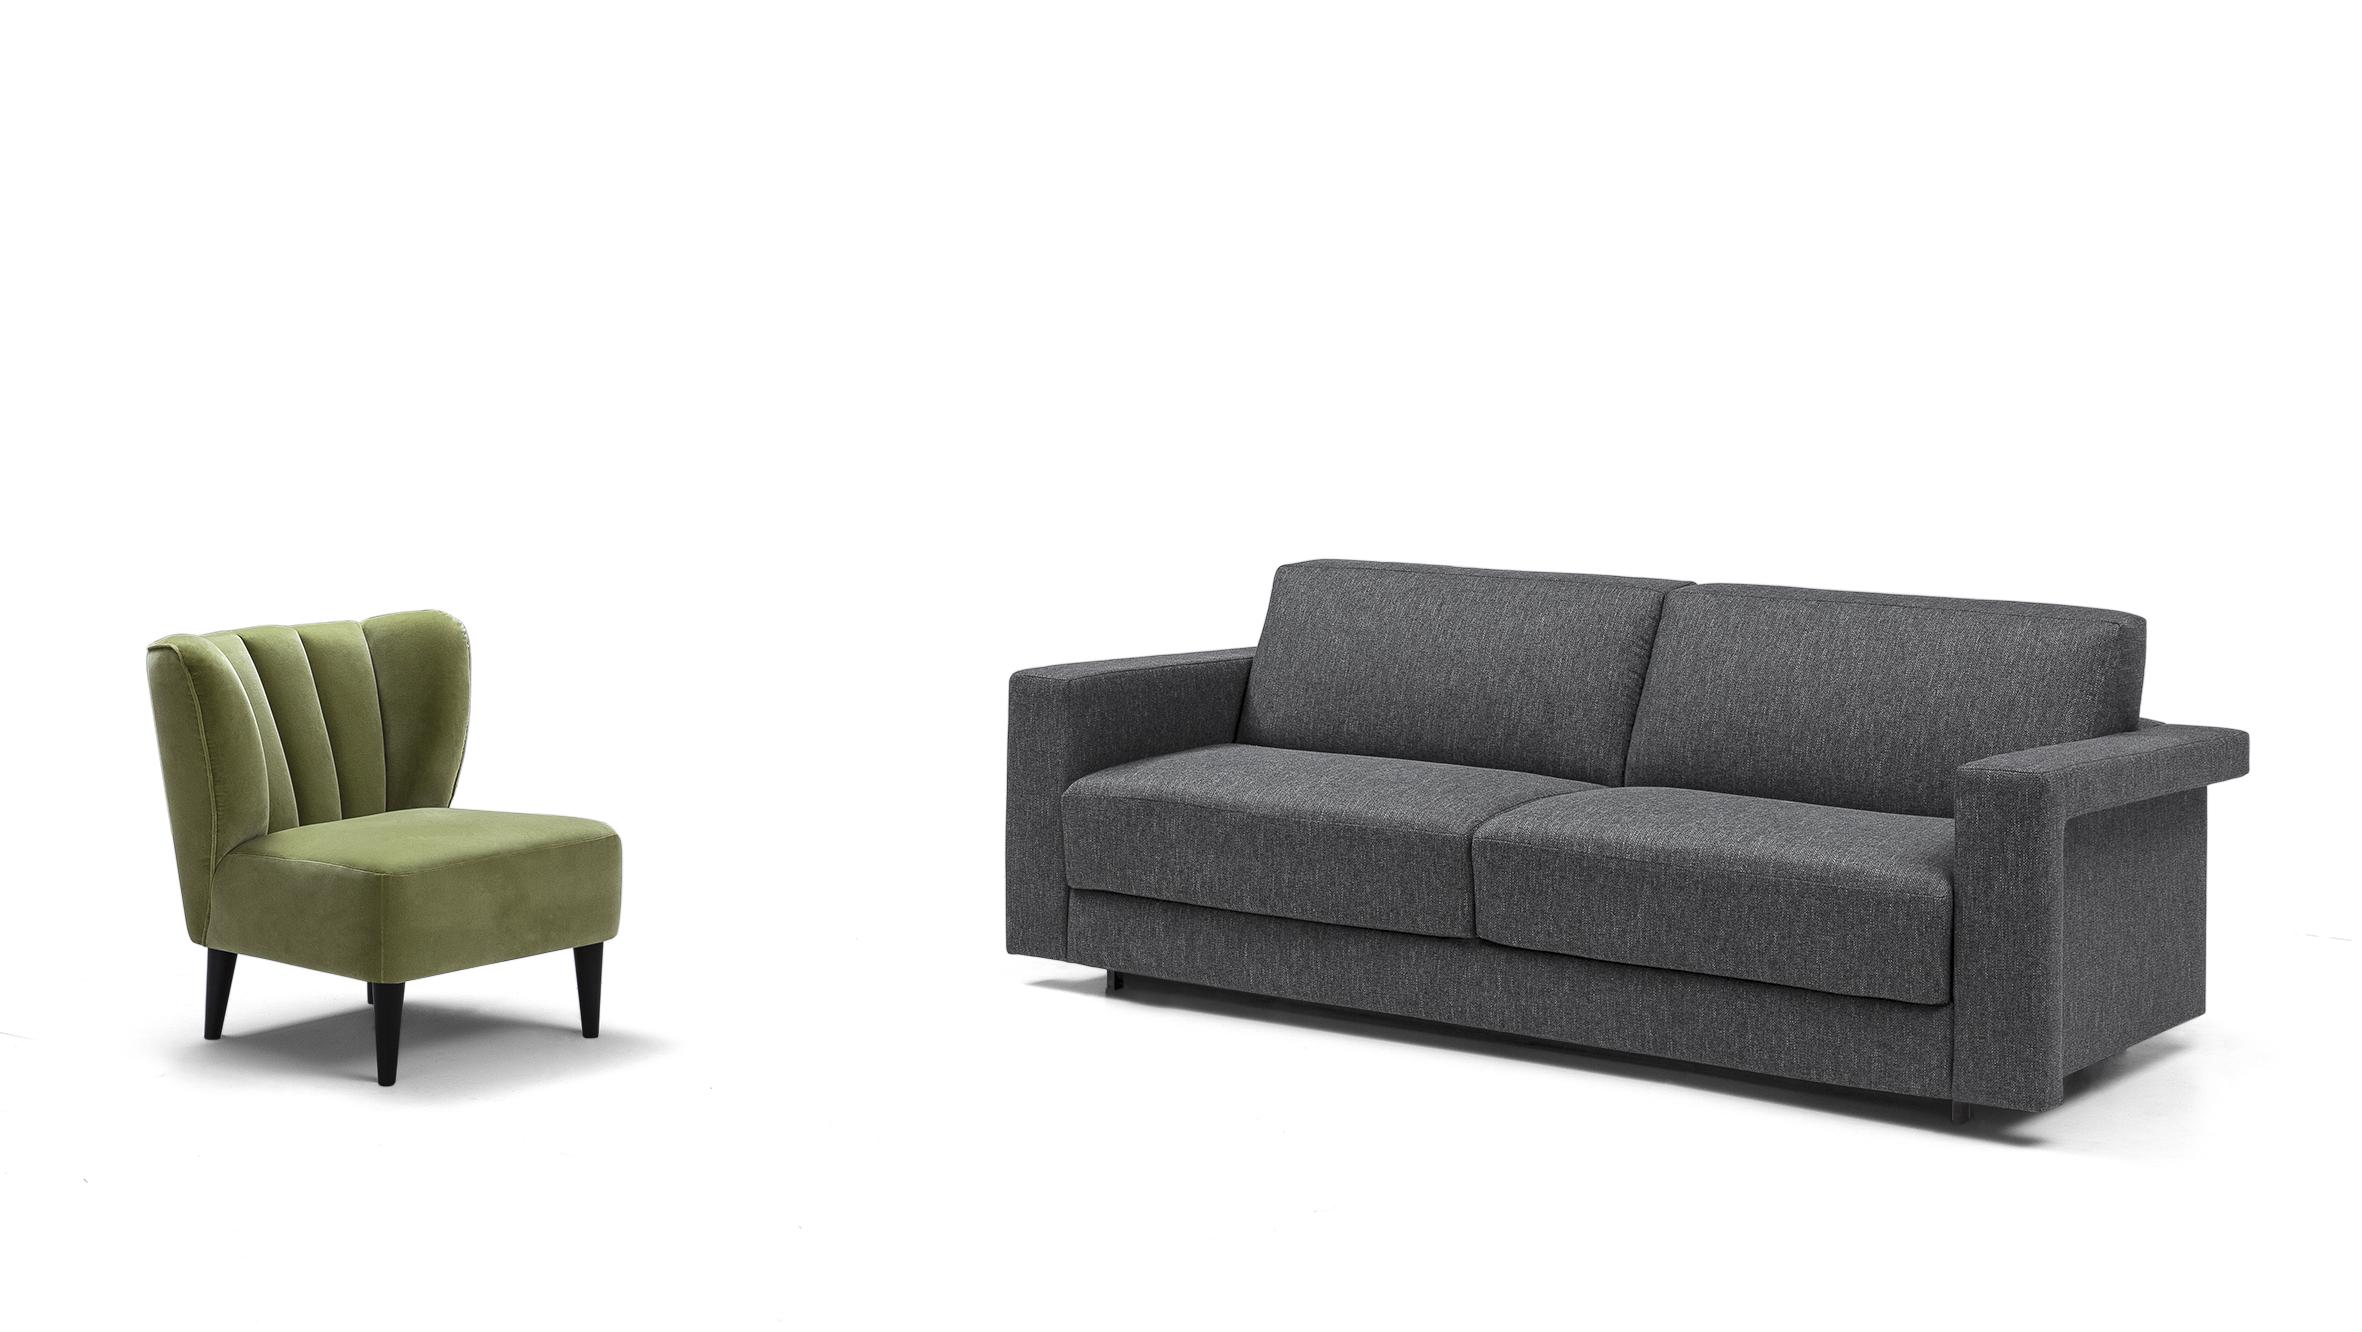 SBD 103 Modern Sofa Beds